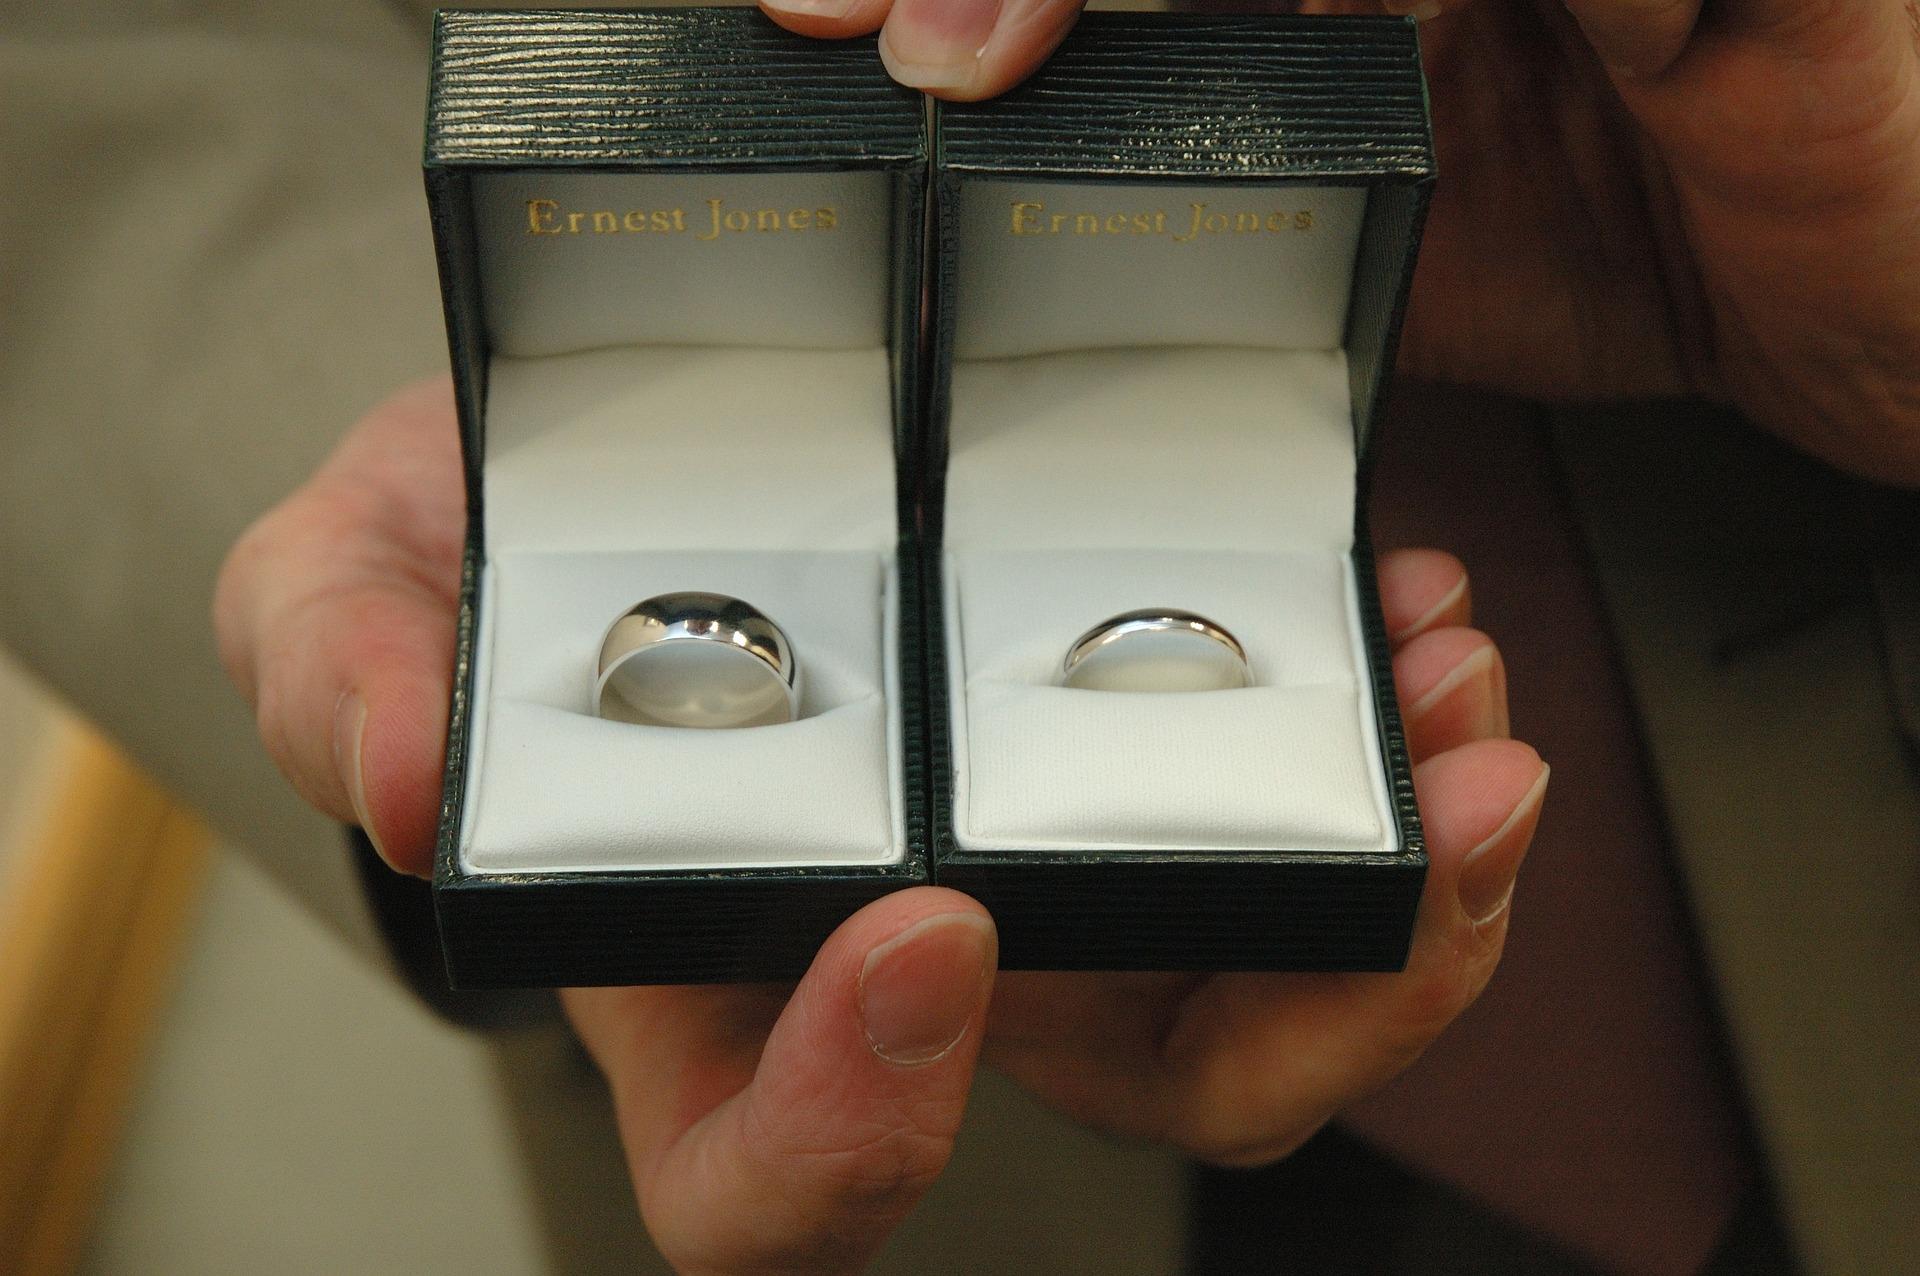 Prumerna Cena Svatby A Rozpocet Na Svatbu Kolik Stoji Svatba V Cr